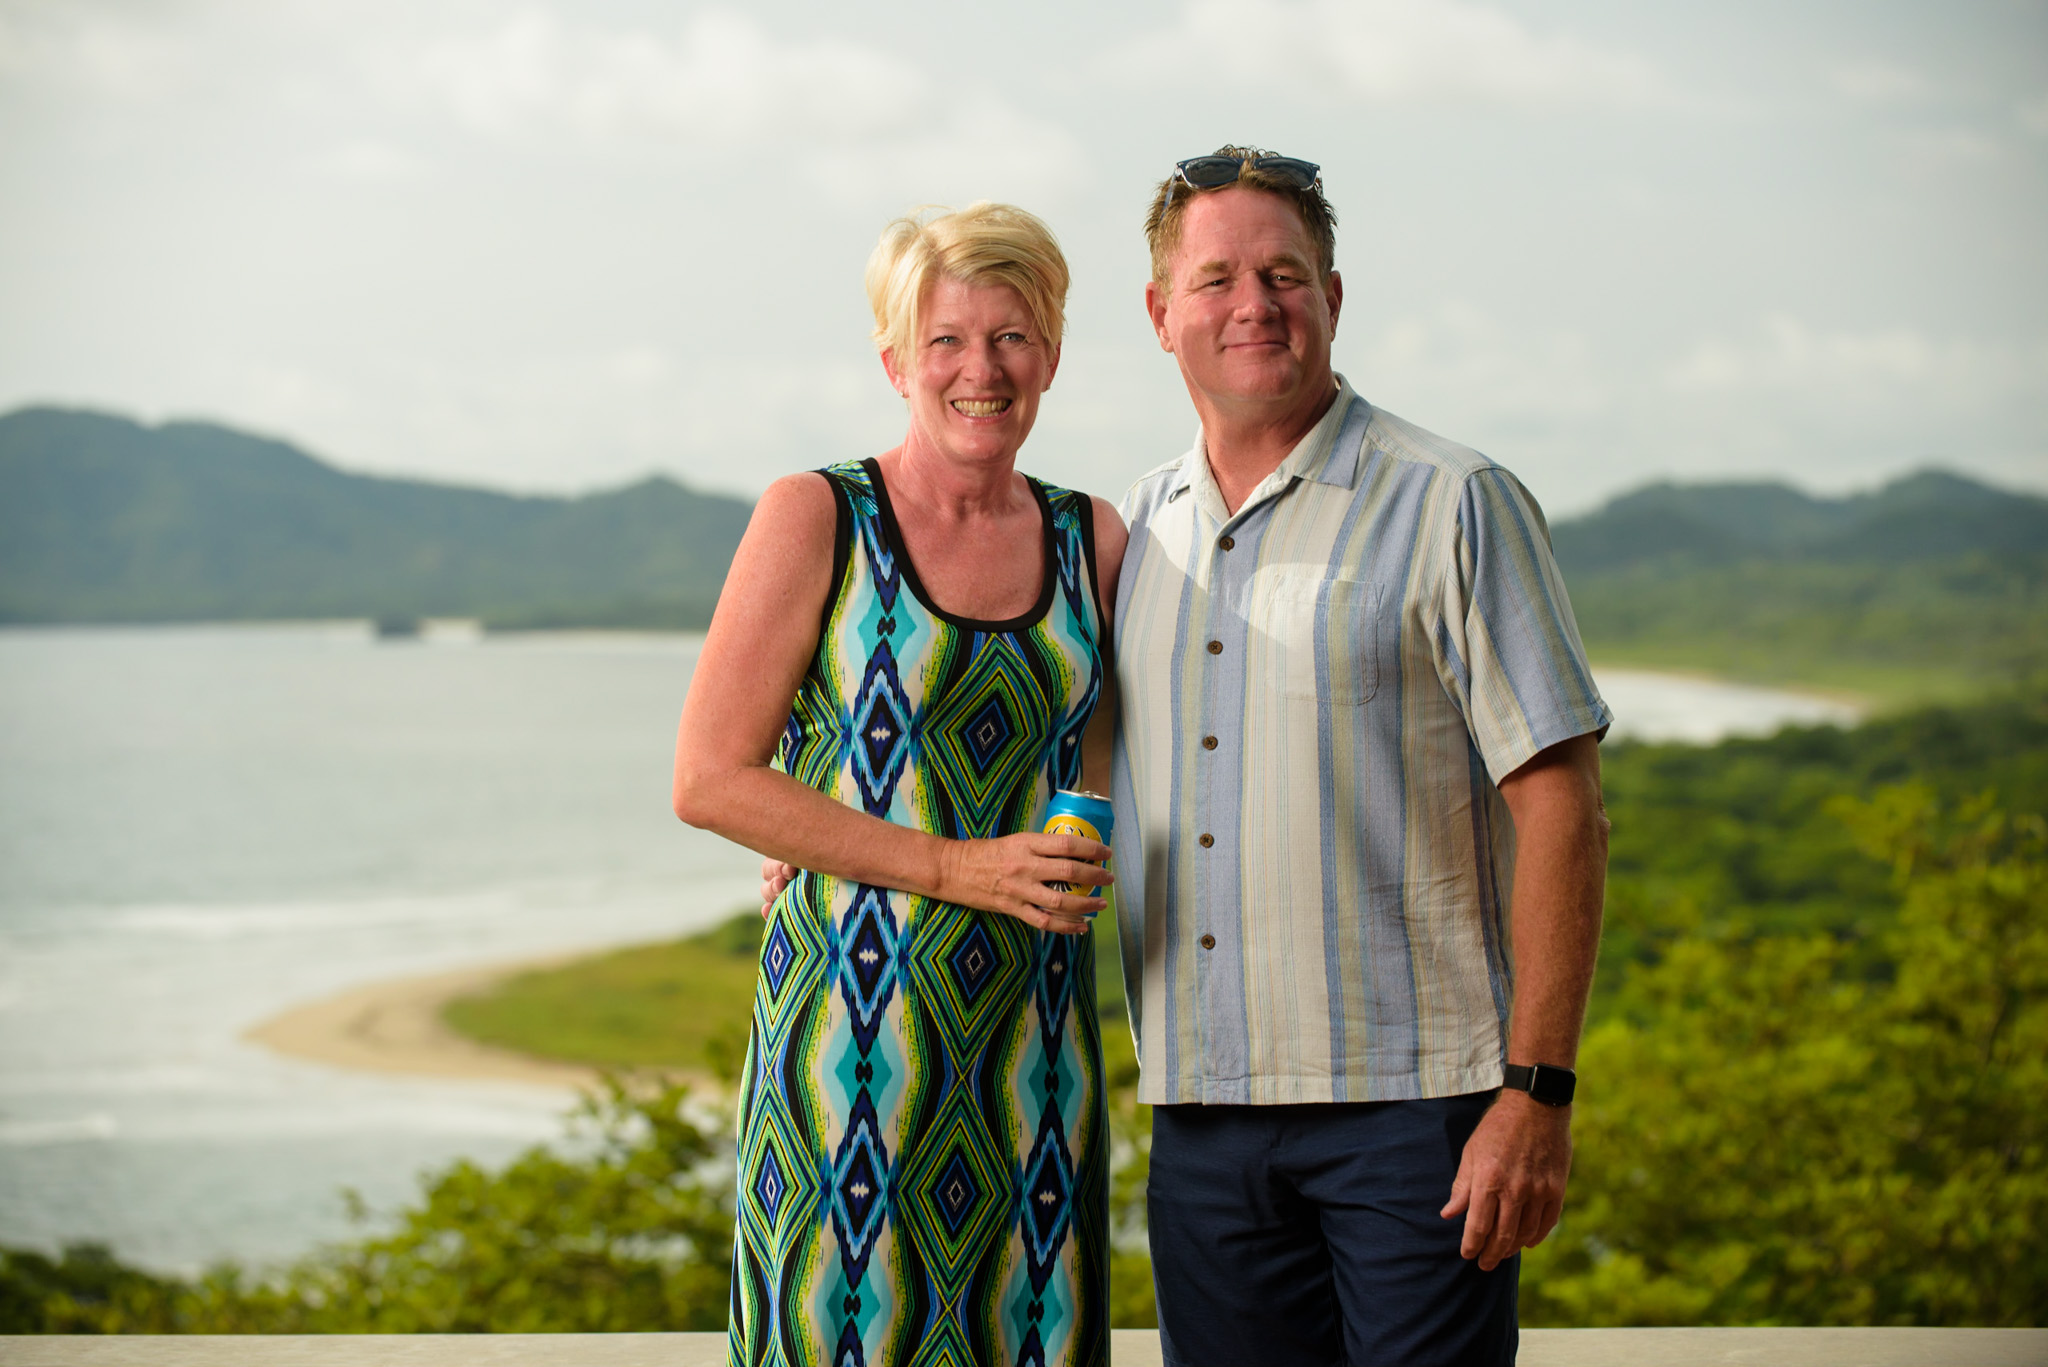 Wedding portraits in Costa Rica